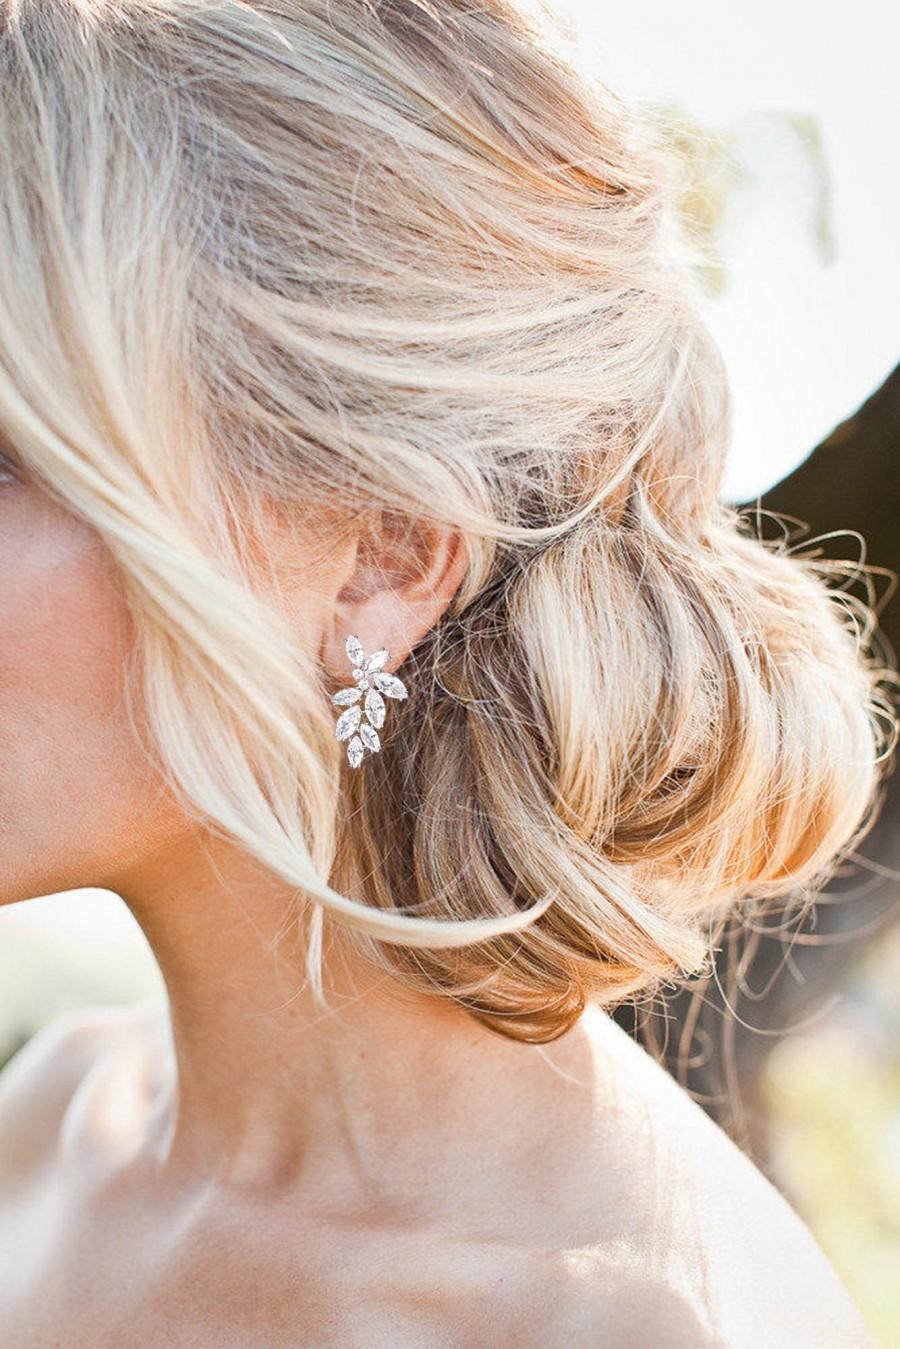 Wedding - Swarovski Crystal Earrings Bridal Earrings Drop Wedding Earrings Bridal Jewelry set Bridesmaids Earrings  Crystal Drop Earrings